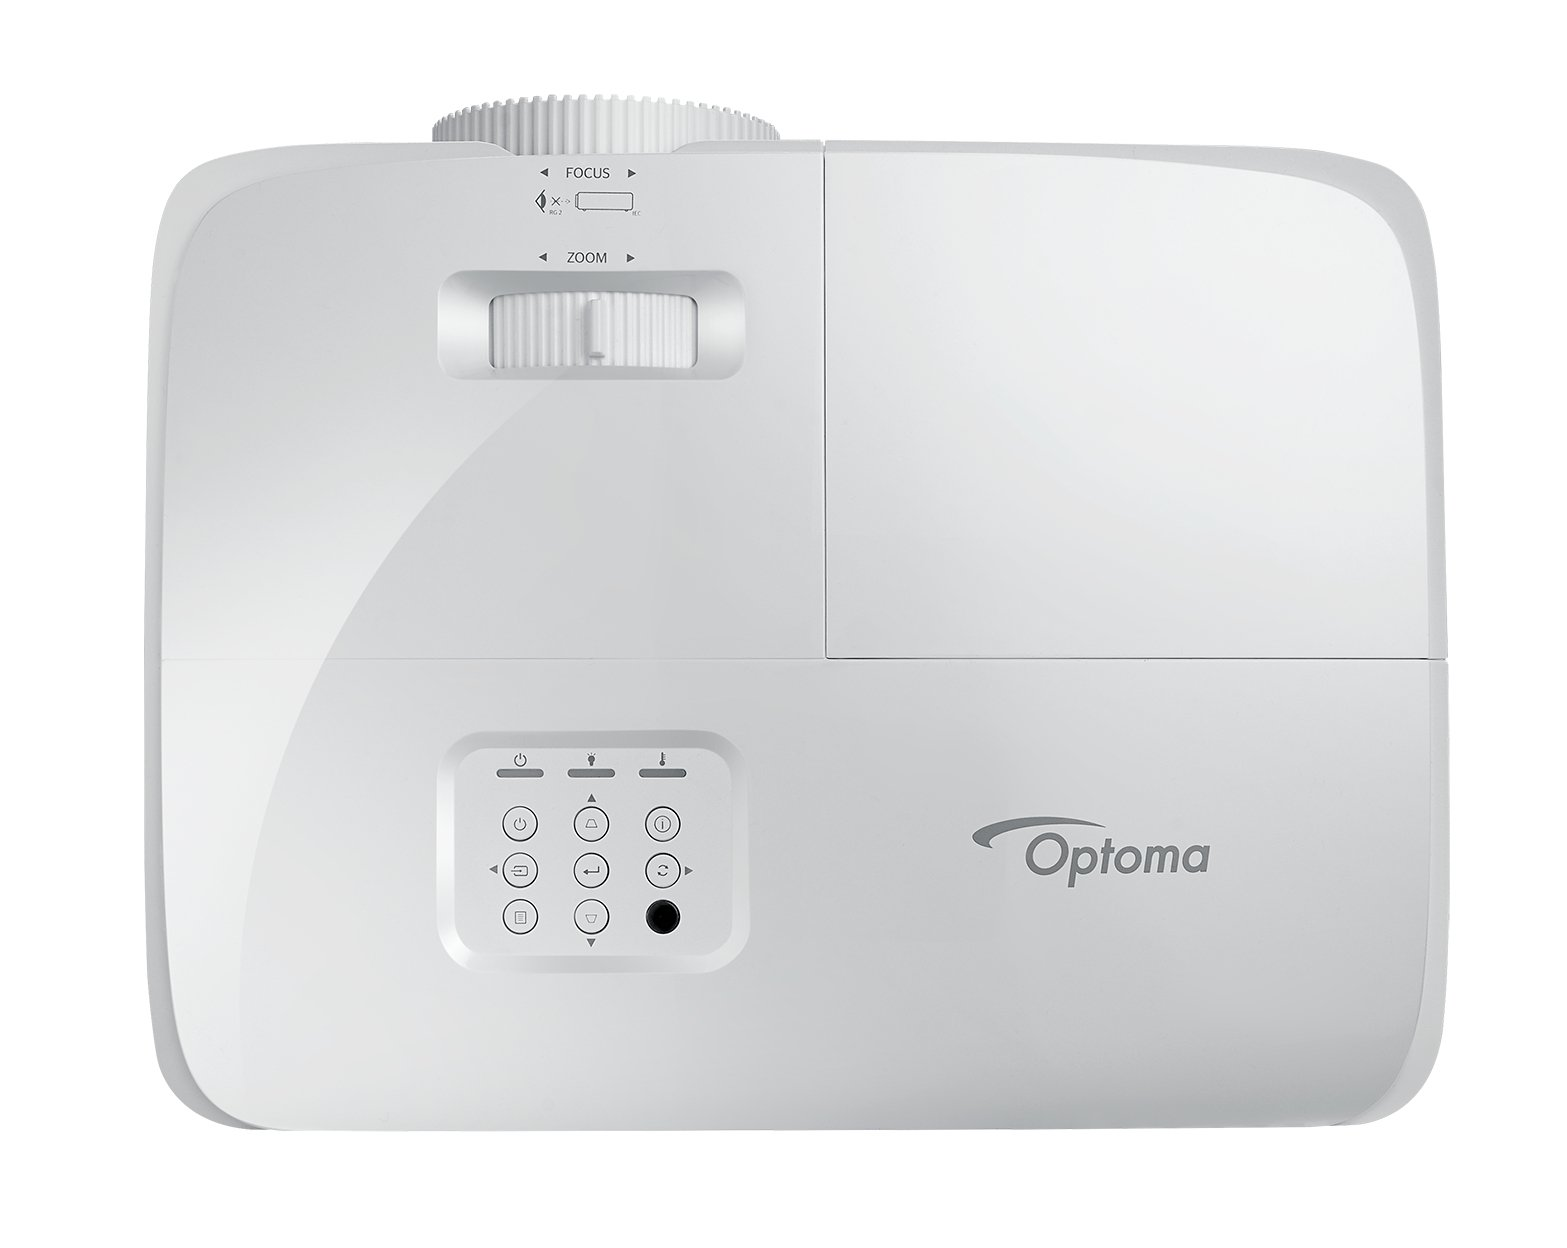 Optoma HD39HDR 4000 Lumens 1080p DLP Projector | Full